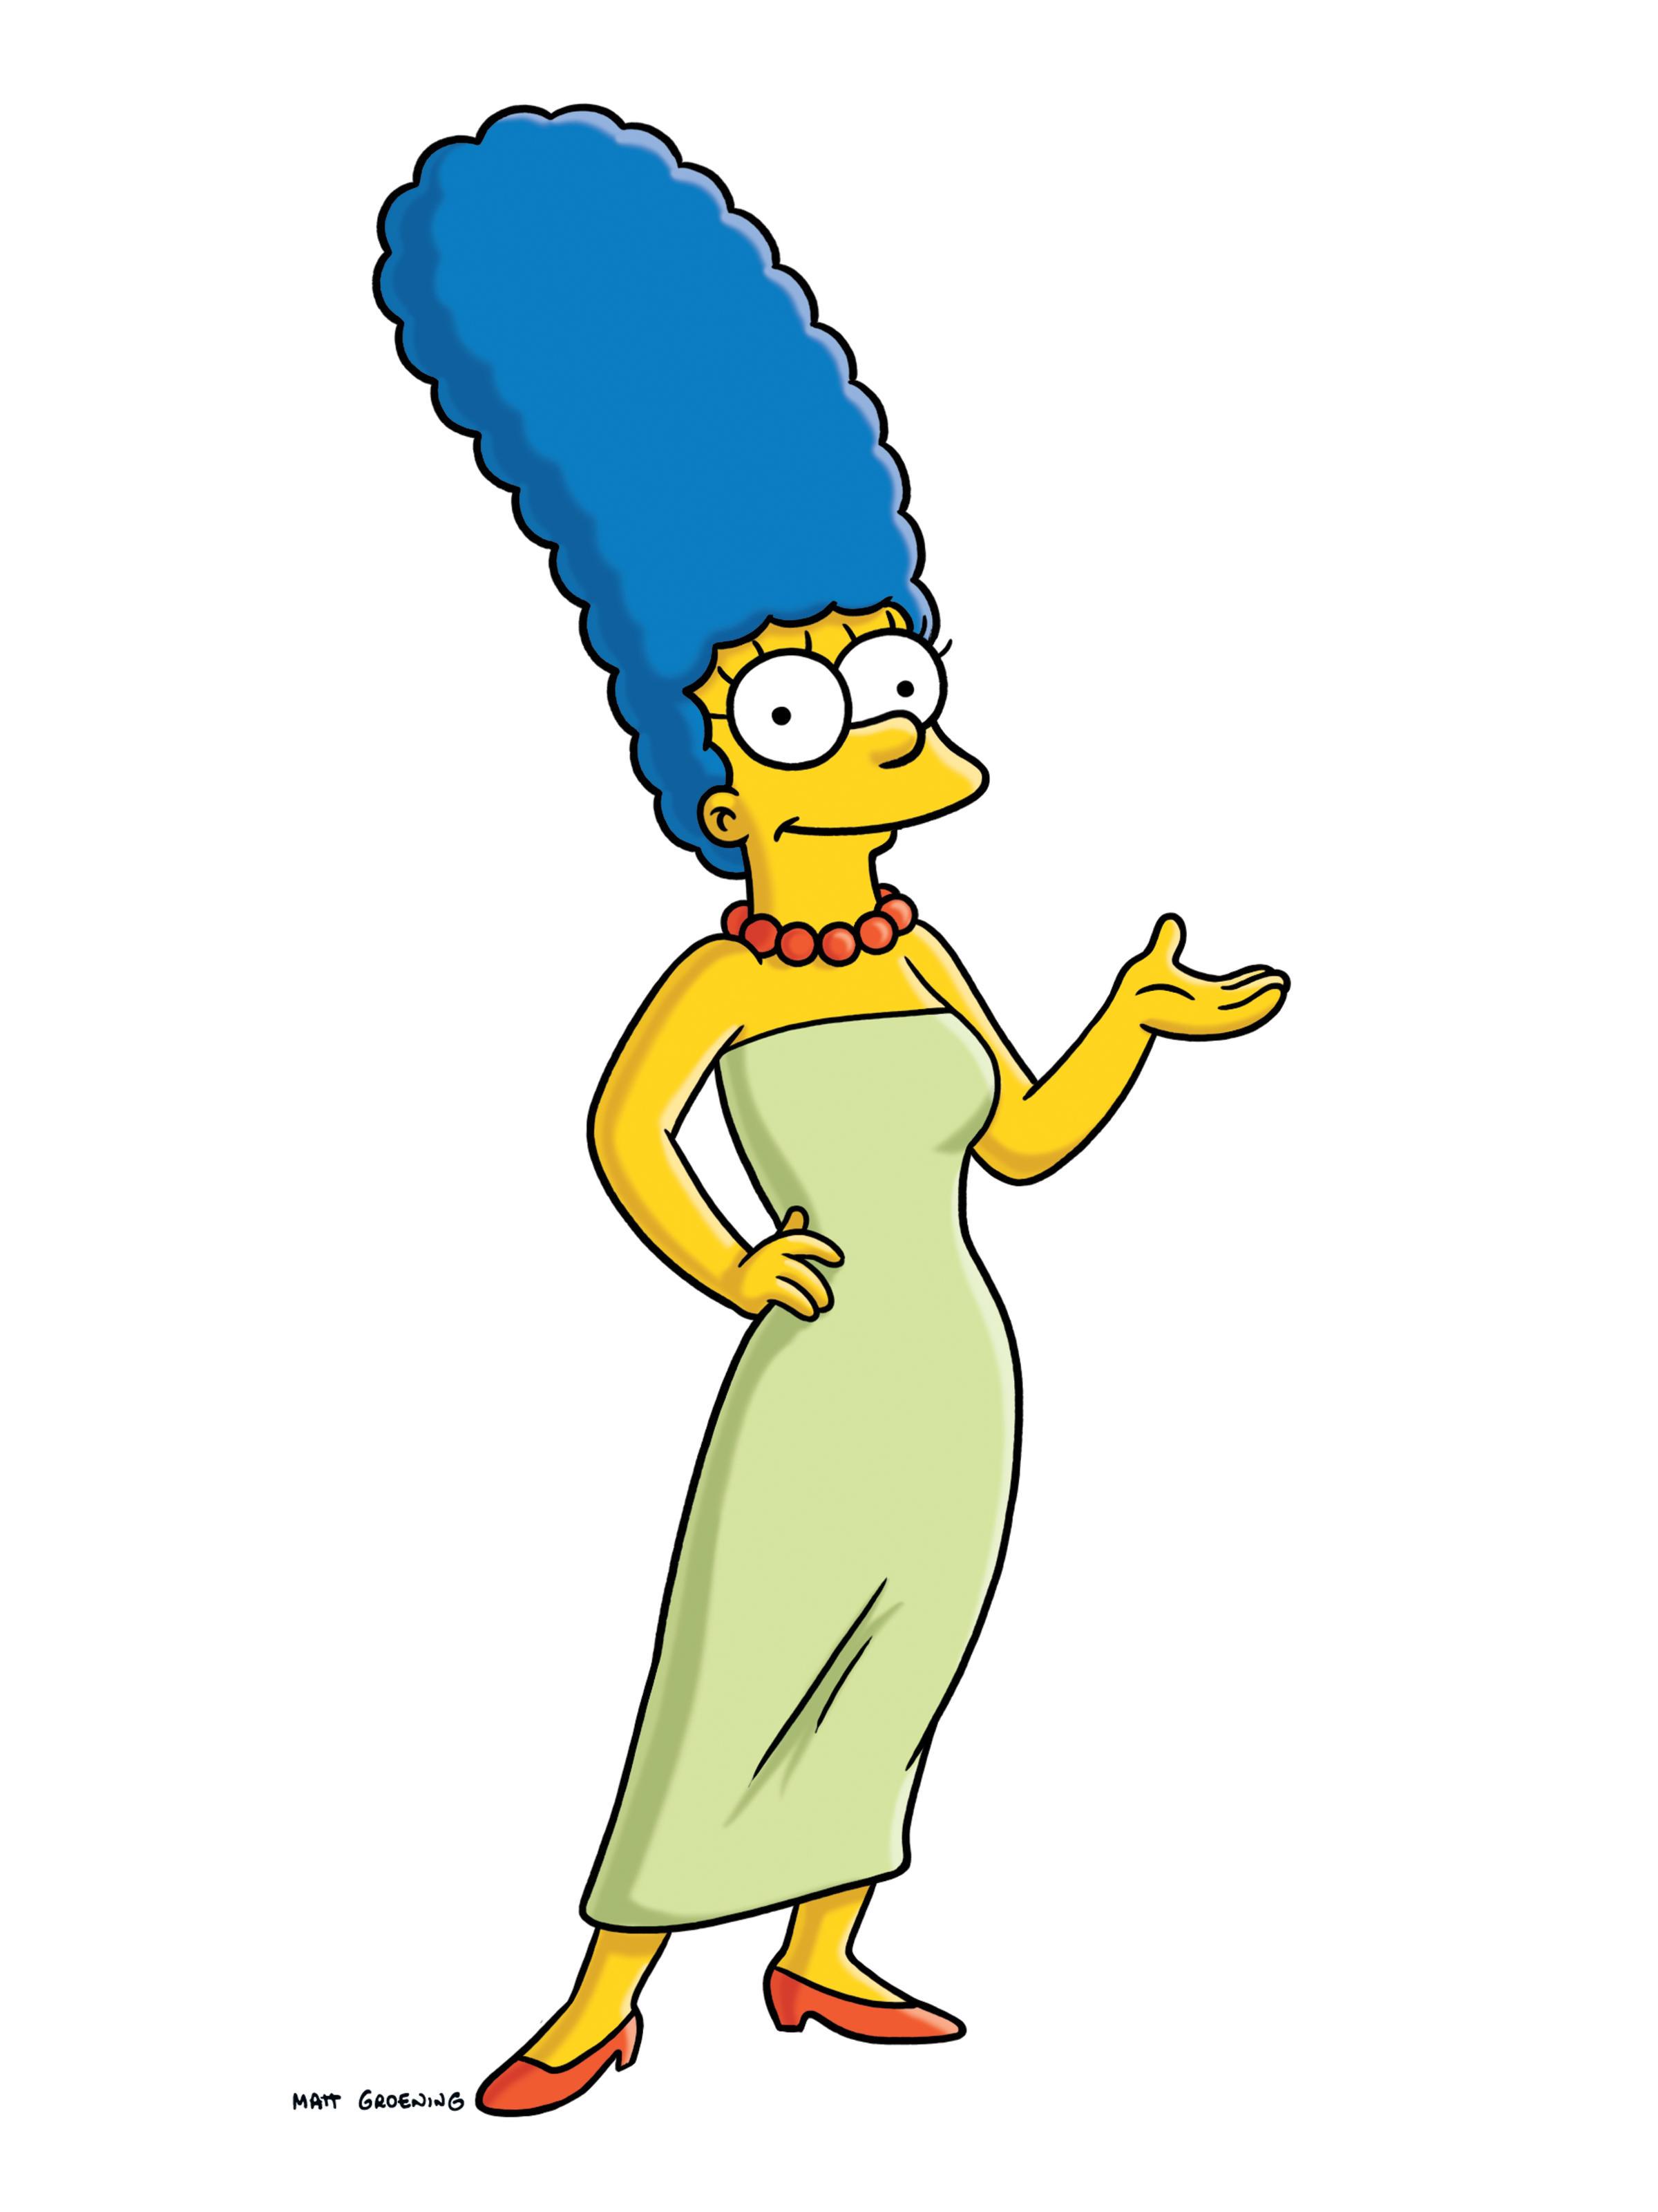 Matt Groening's Mother, Inspiration For Marge Simpson, Dies ...